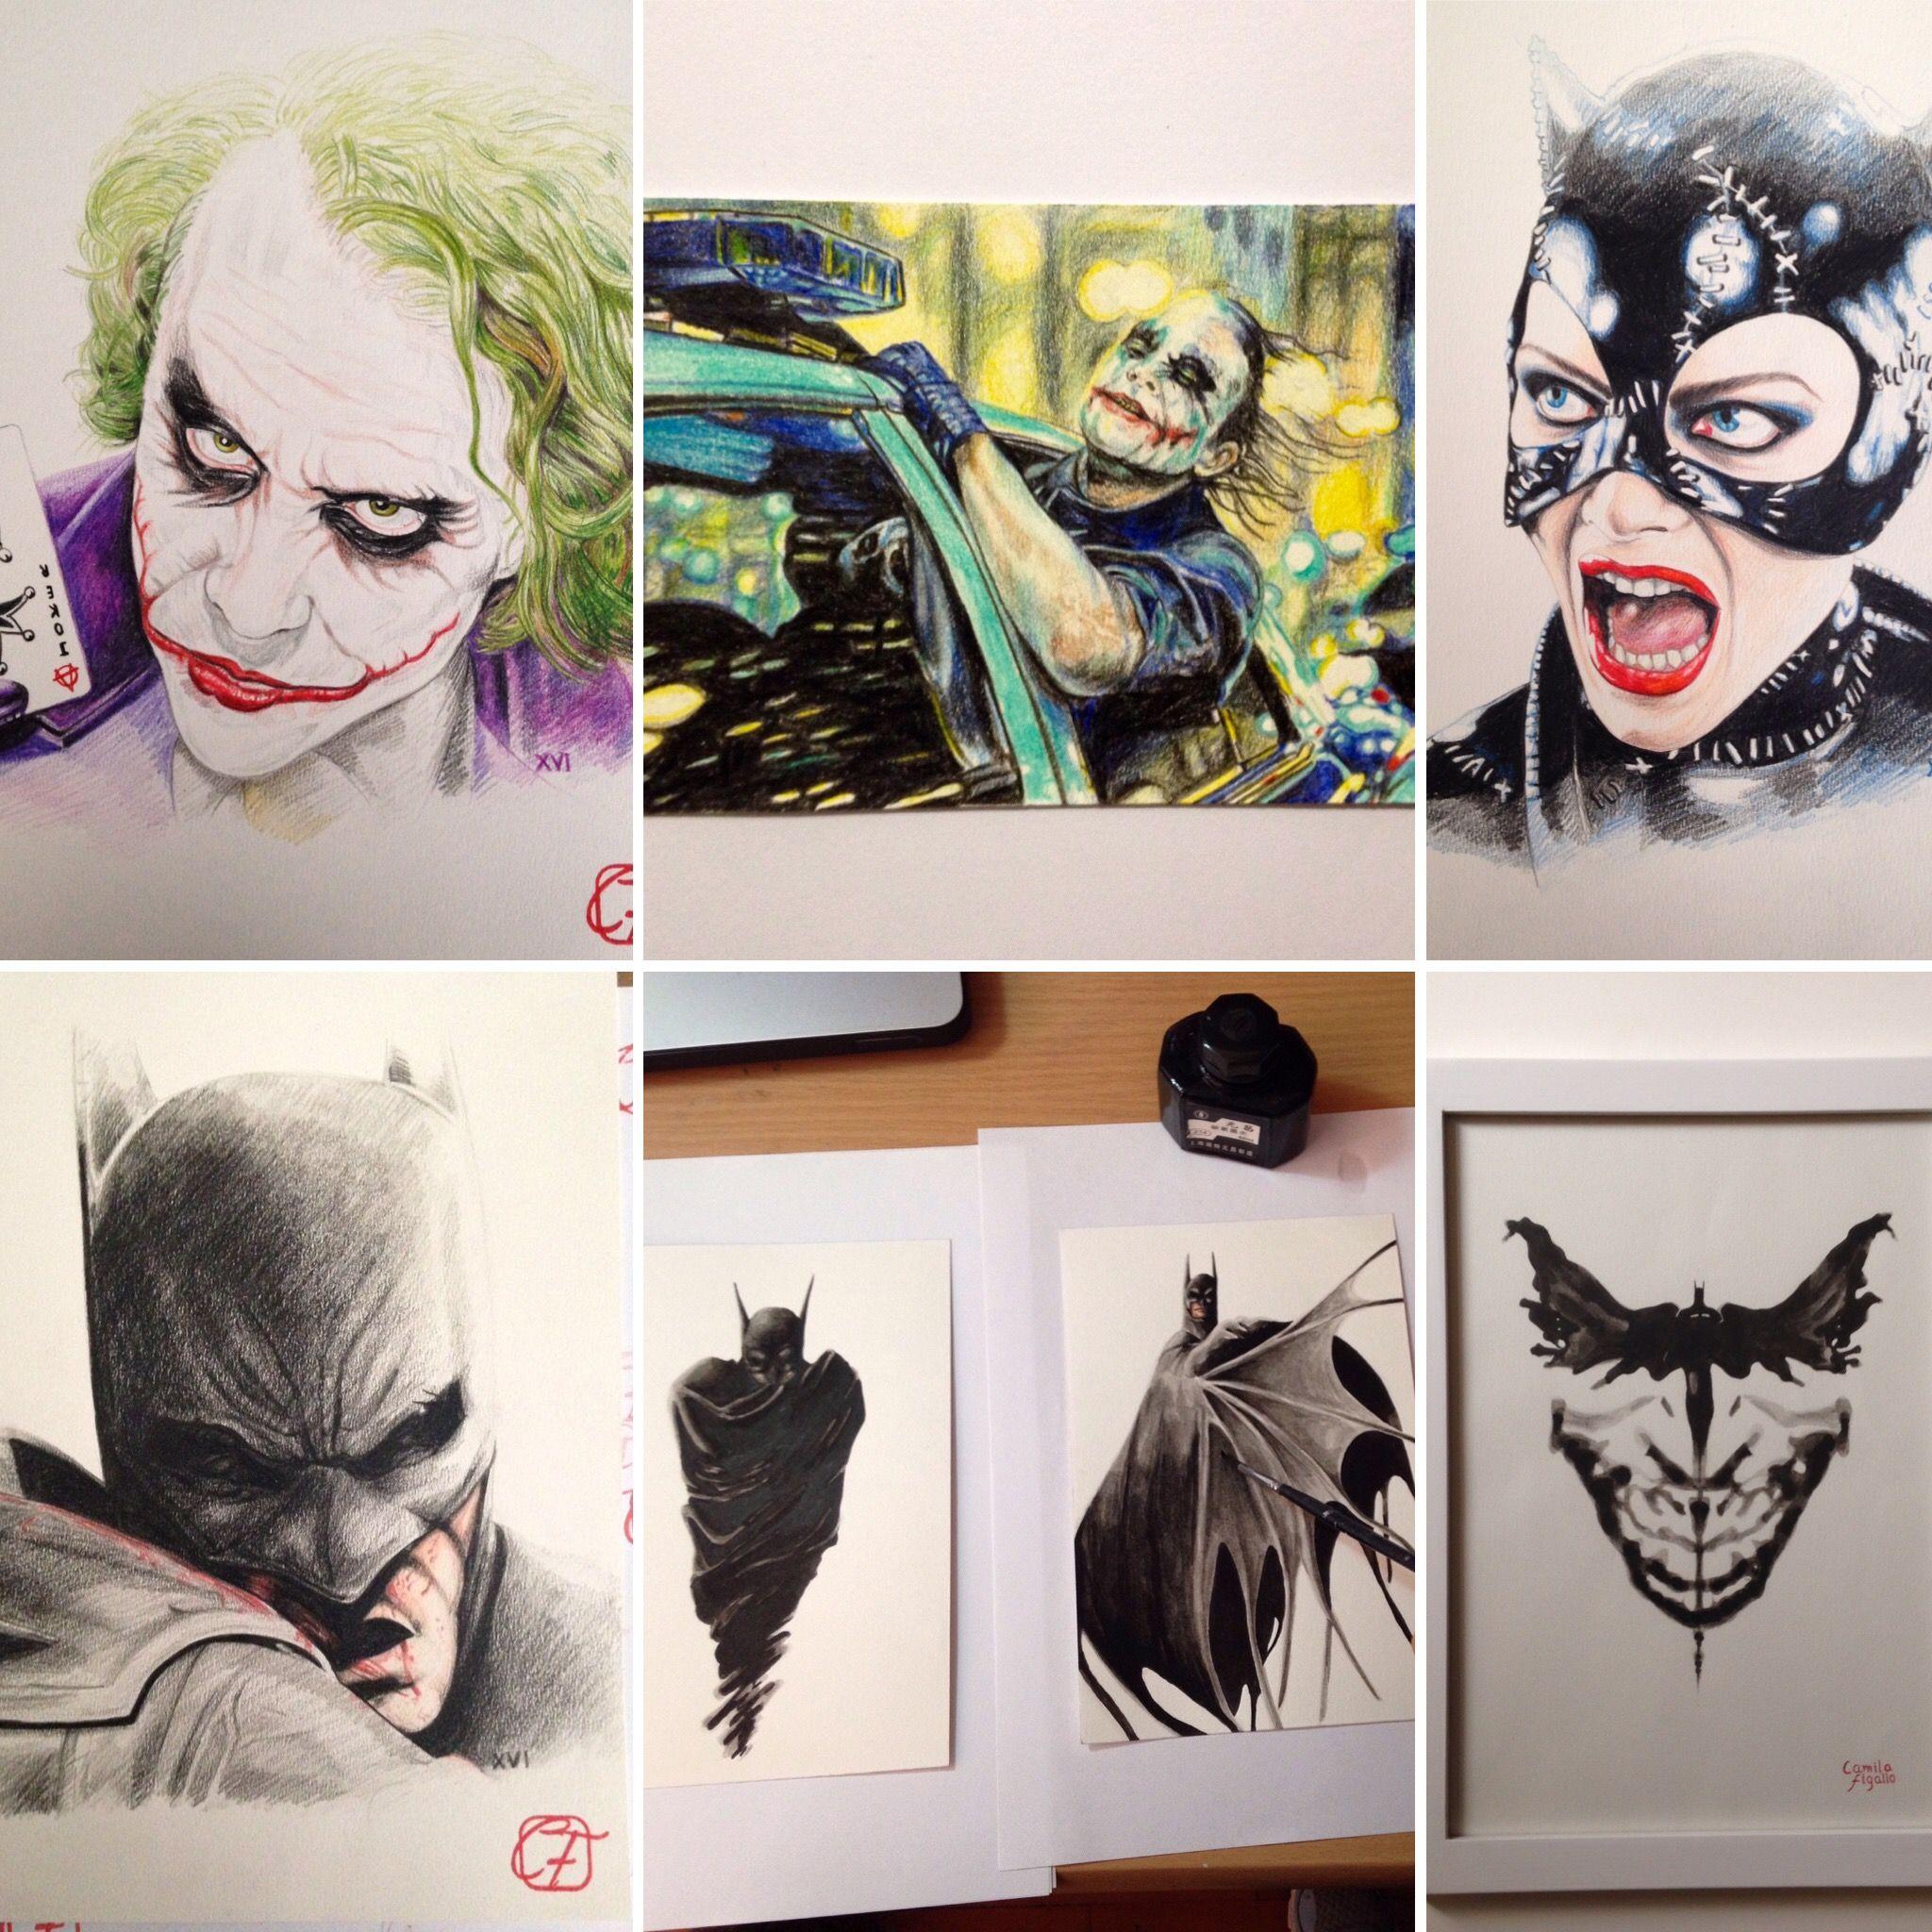 Dibujos a pedido de tu personaje favorito Batman Guasn